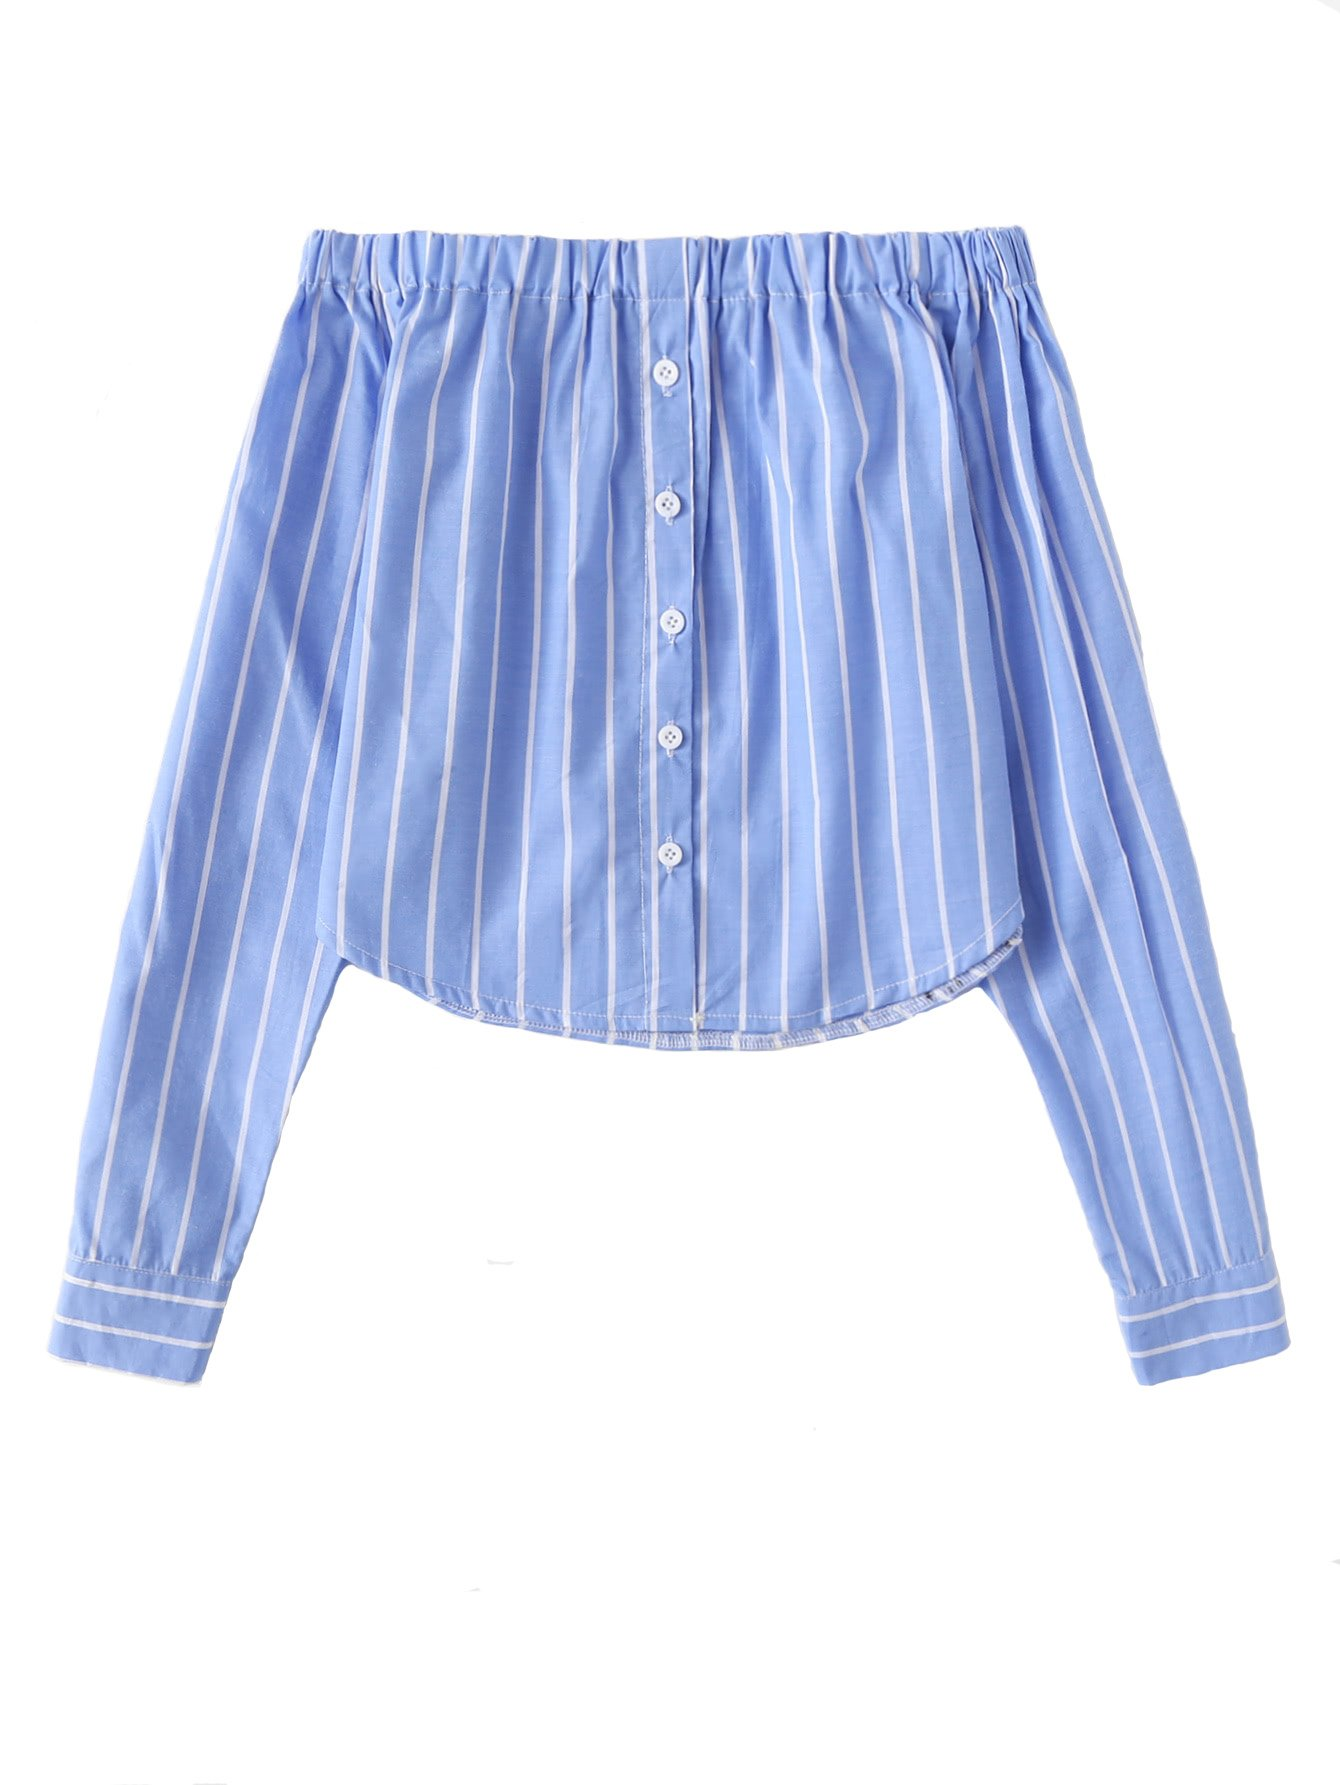 Penpell Vintage Elegant Women's Summer Cute Single Breasted Off Shoulder Blue Striped Crop Top Casual Ruffle Crop Top Long Sleeve Tops M